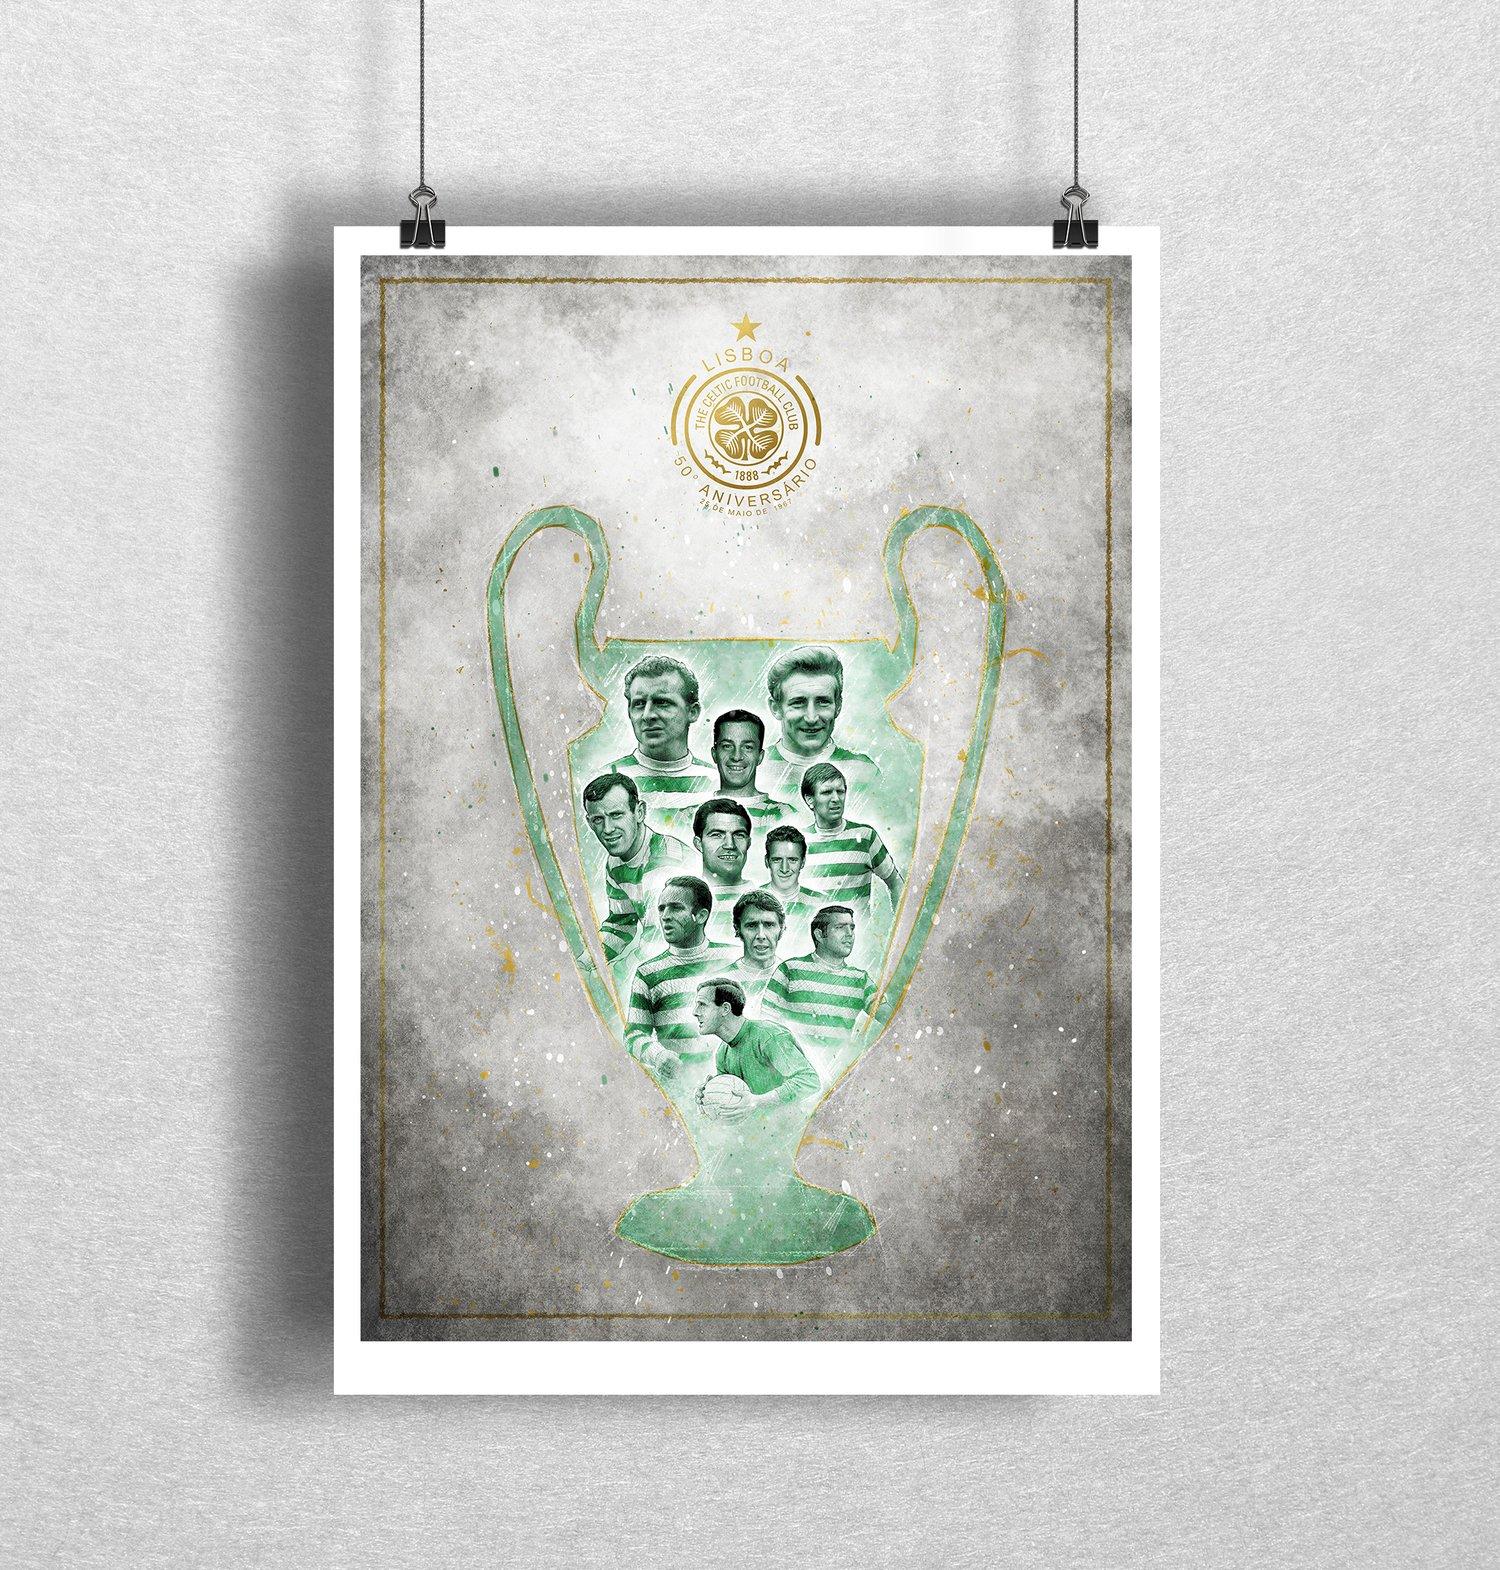 Image of Lisbon Lions Cup Art Print